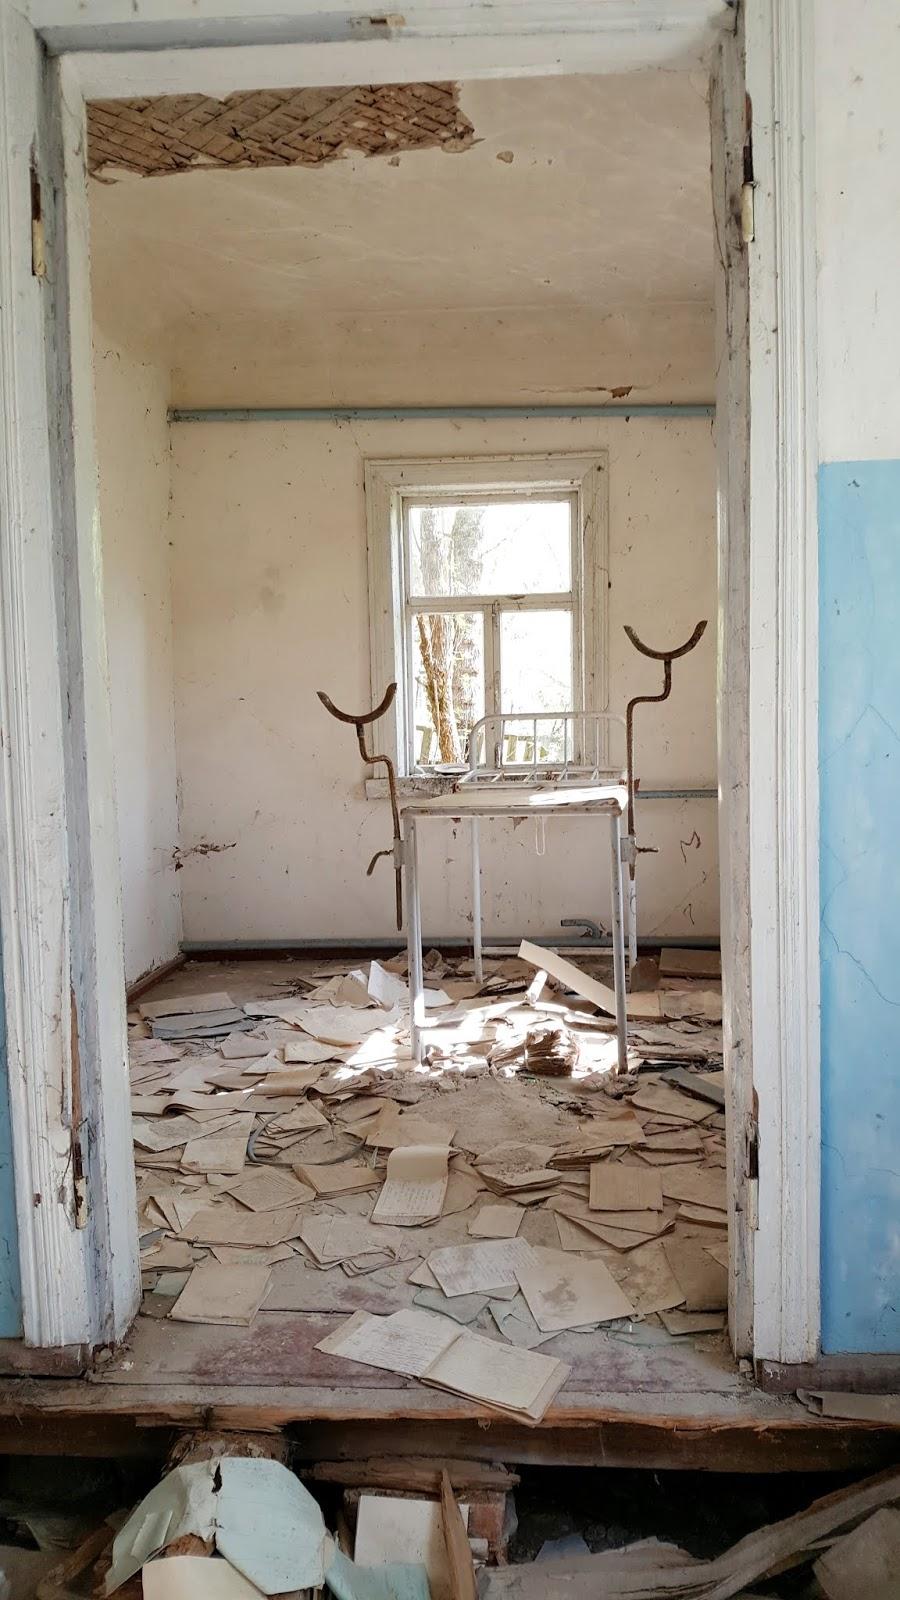 Porta Vela Door 2000.Trepsim Po Pasaulį Cernobylis